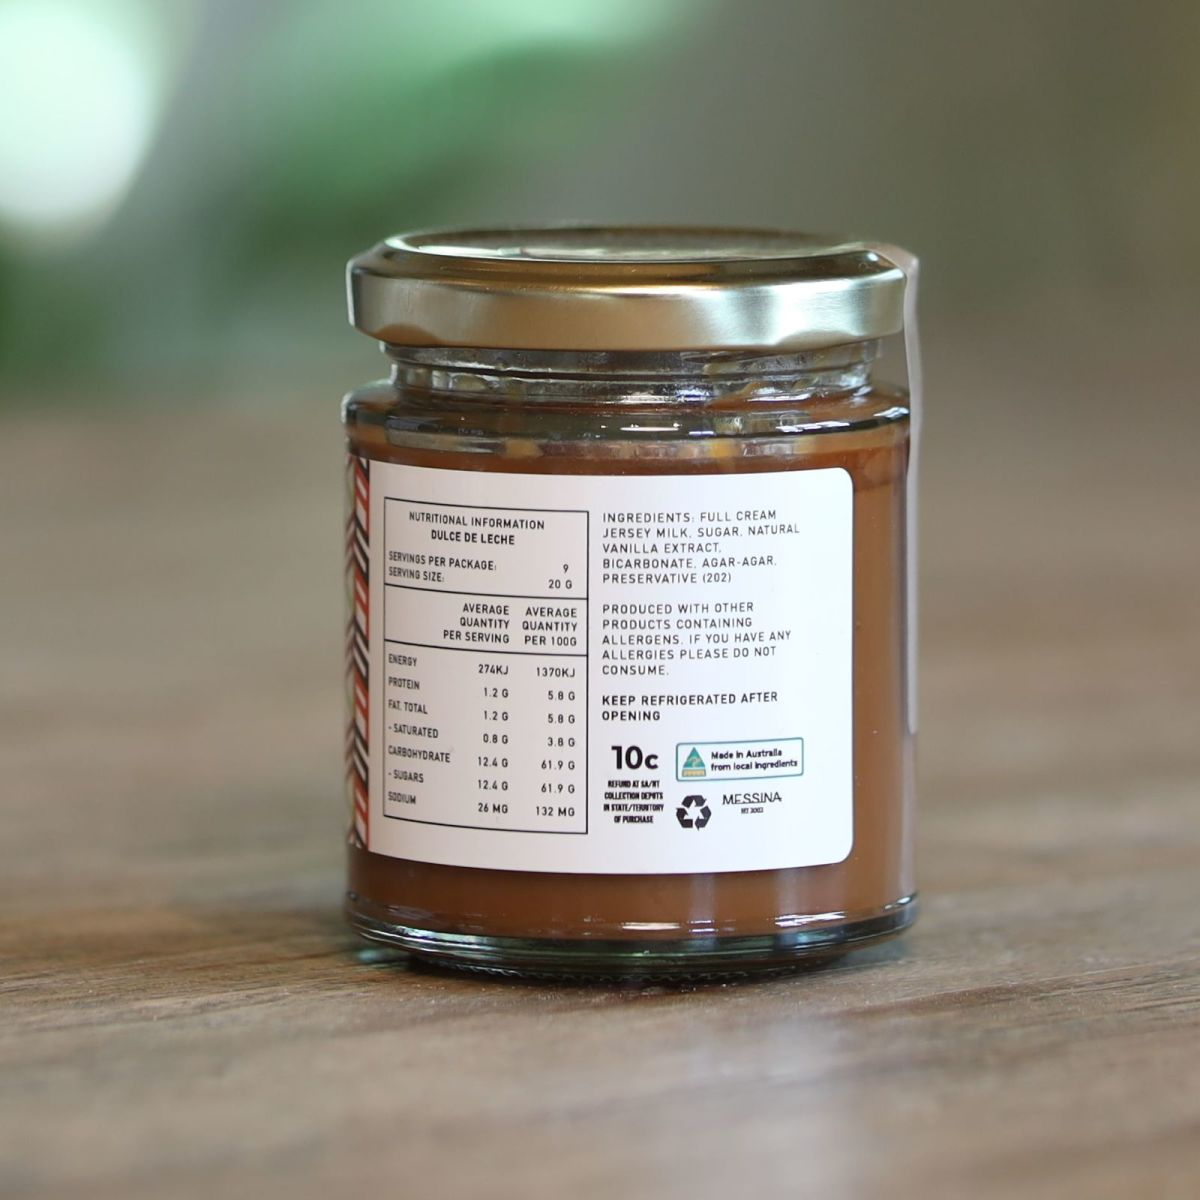 Gelato Messina - Dulce de Leche (Argentinian Milk Jam)